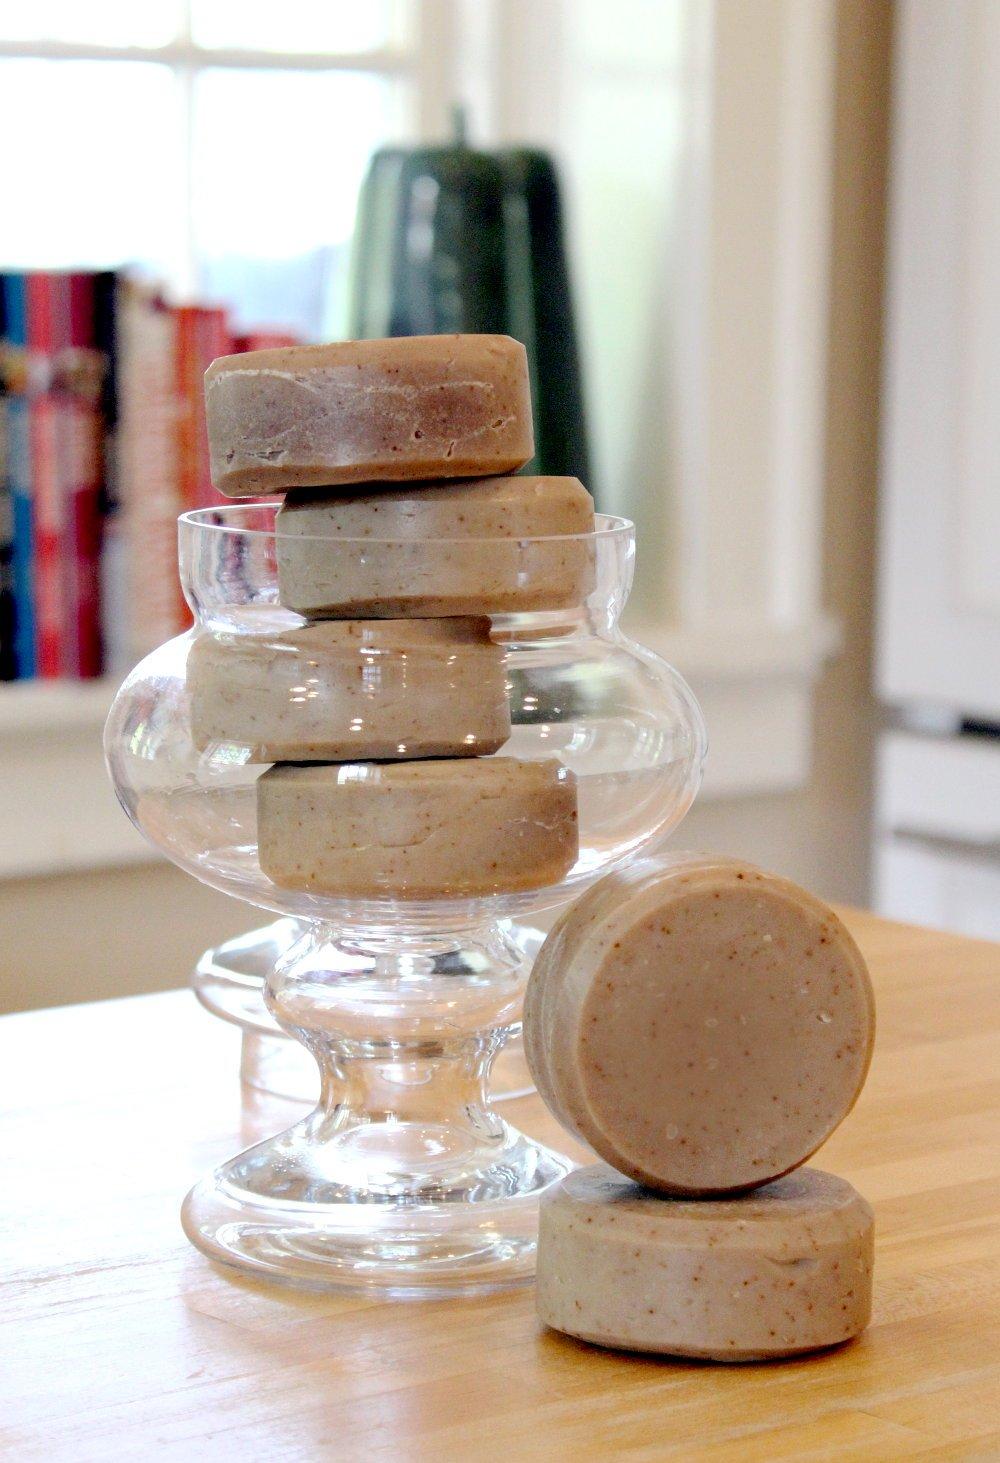 Yogurt Amp Banana Soap Recipe With Organic Flax Seed Oil Soap Deli News